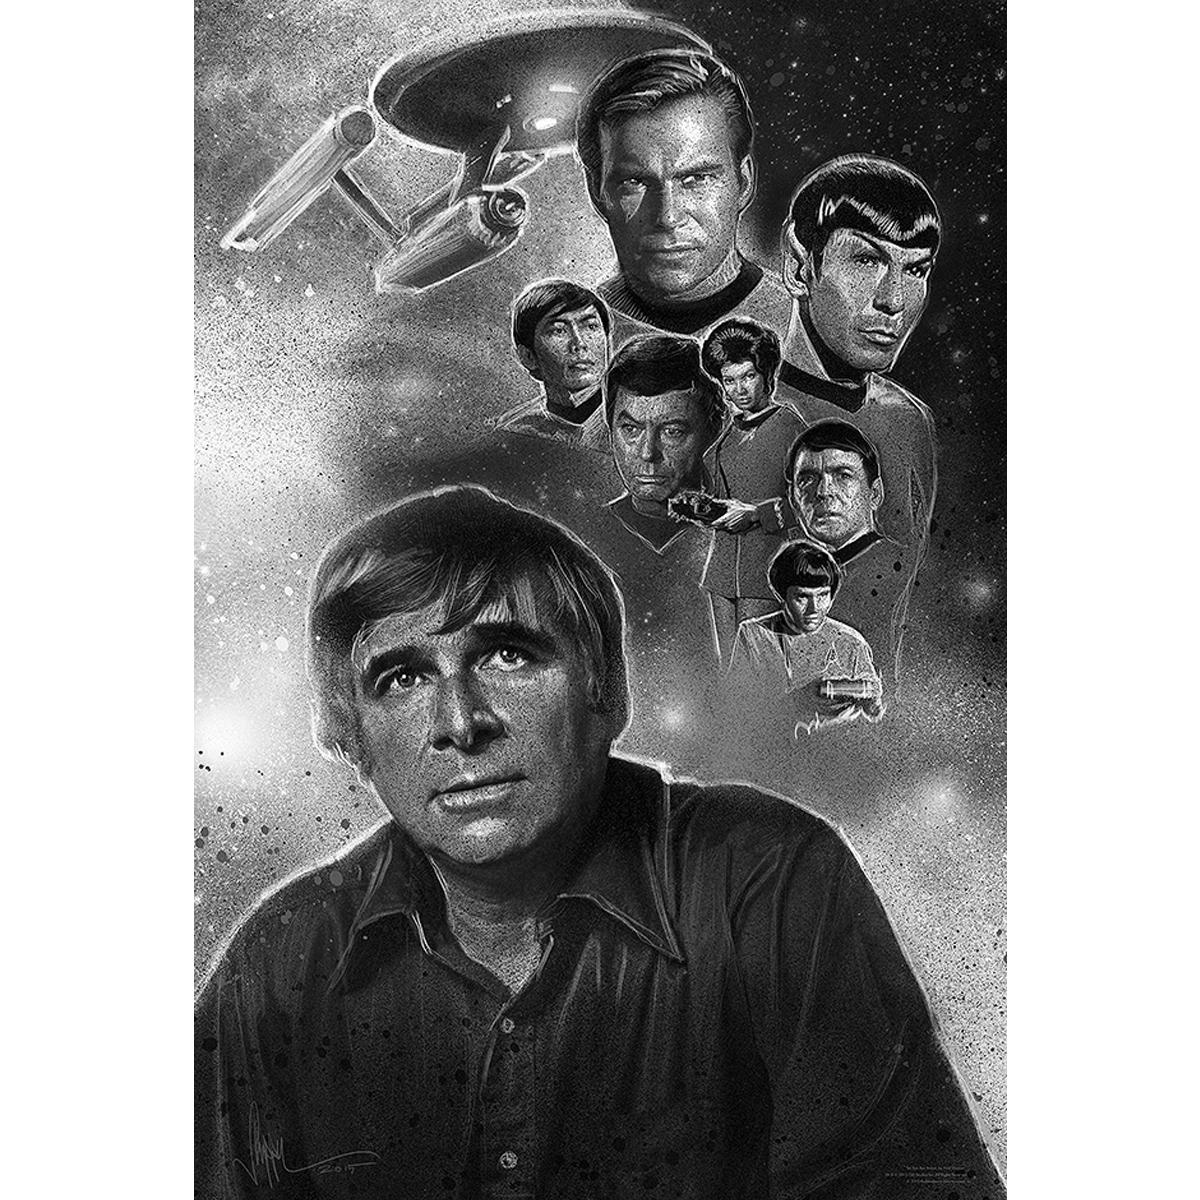 Star Trek Genes Dream Black and White Poster [18x24]